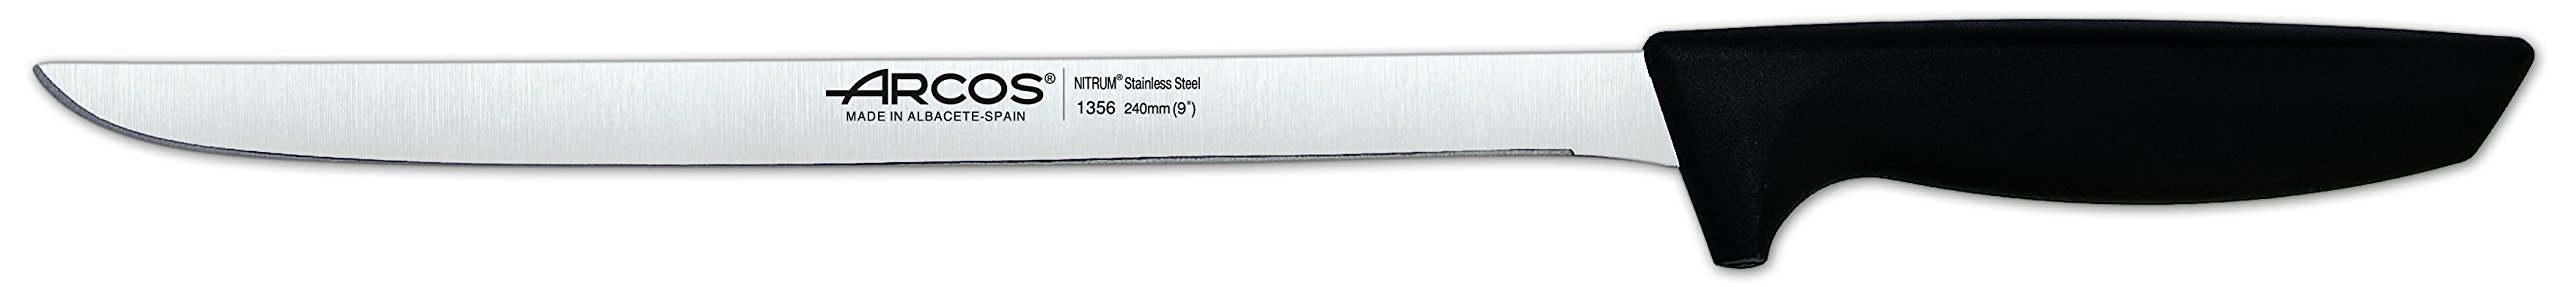 Arcos Niza Spanish flexible Slicing Ham Knife